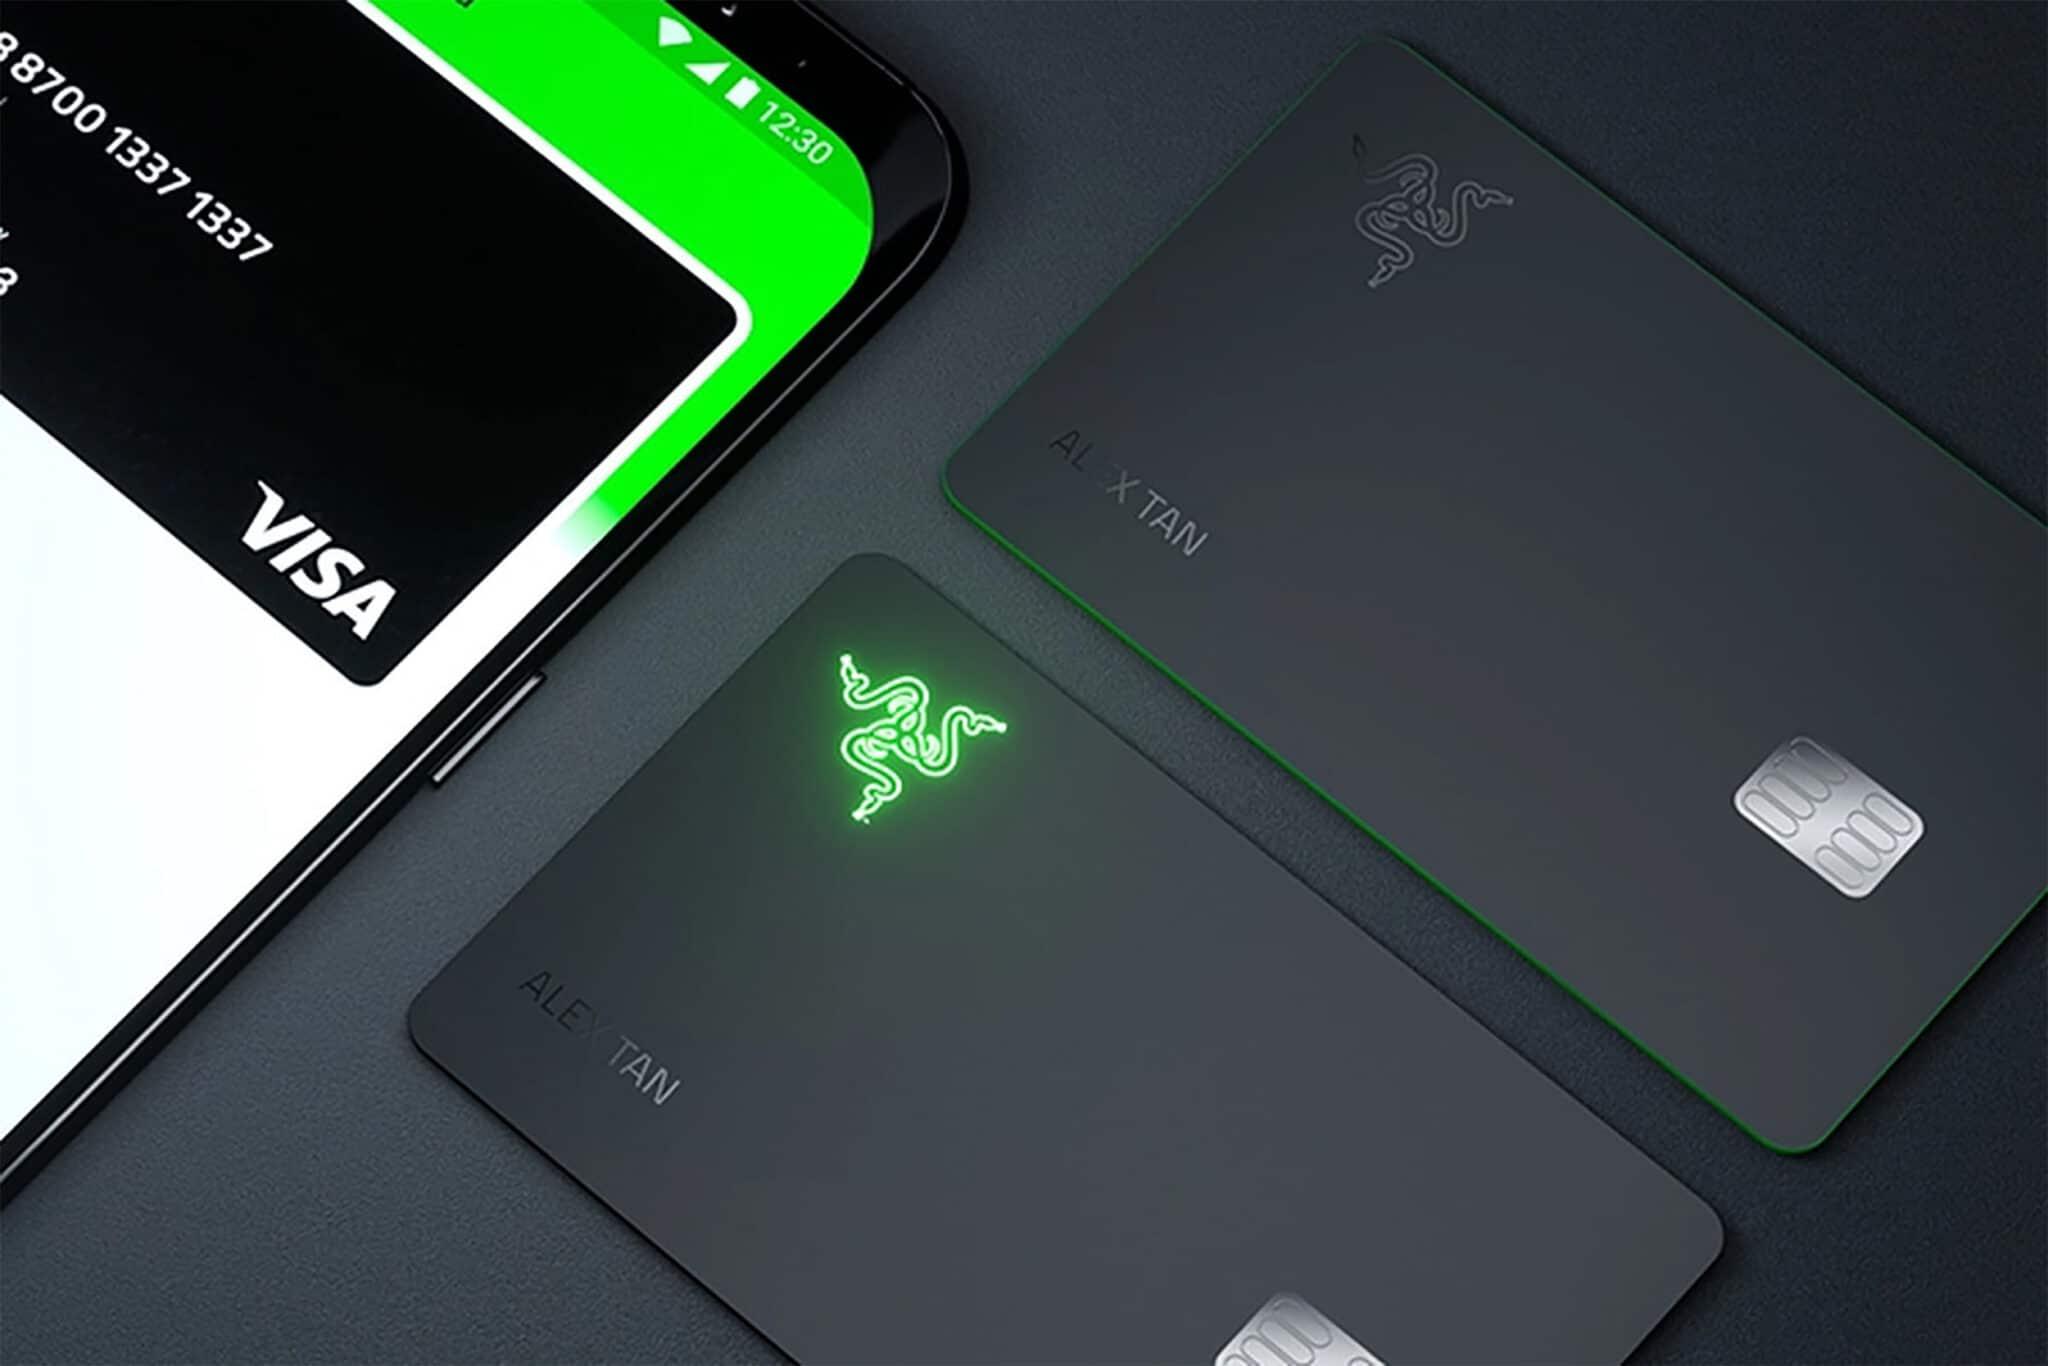 Razer Opens Beta on New Light-Up Prepaid Visa Card